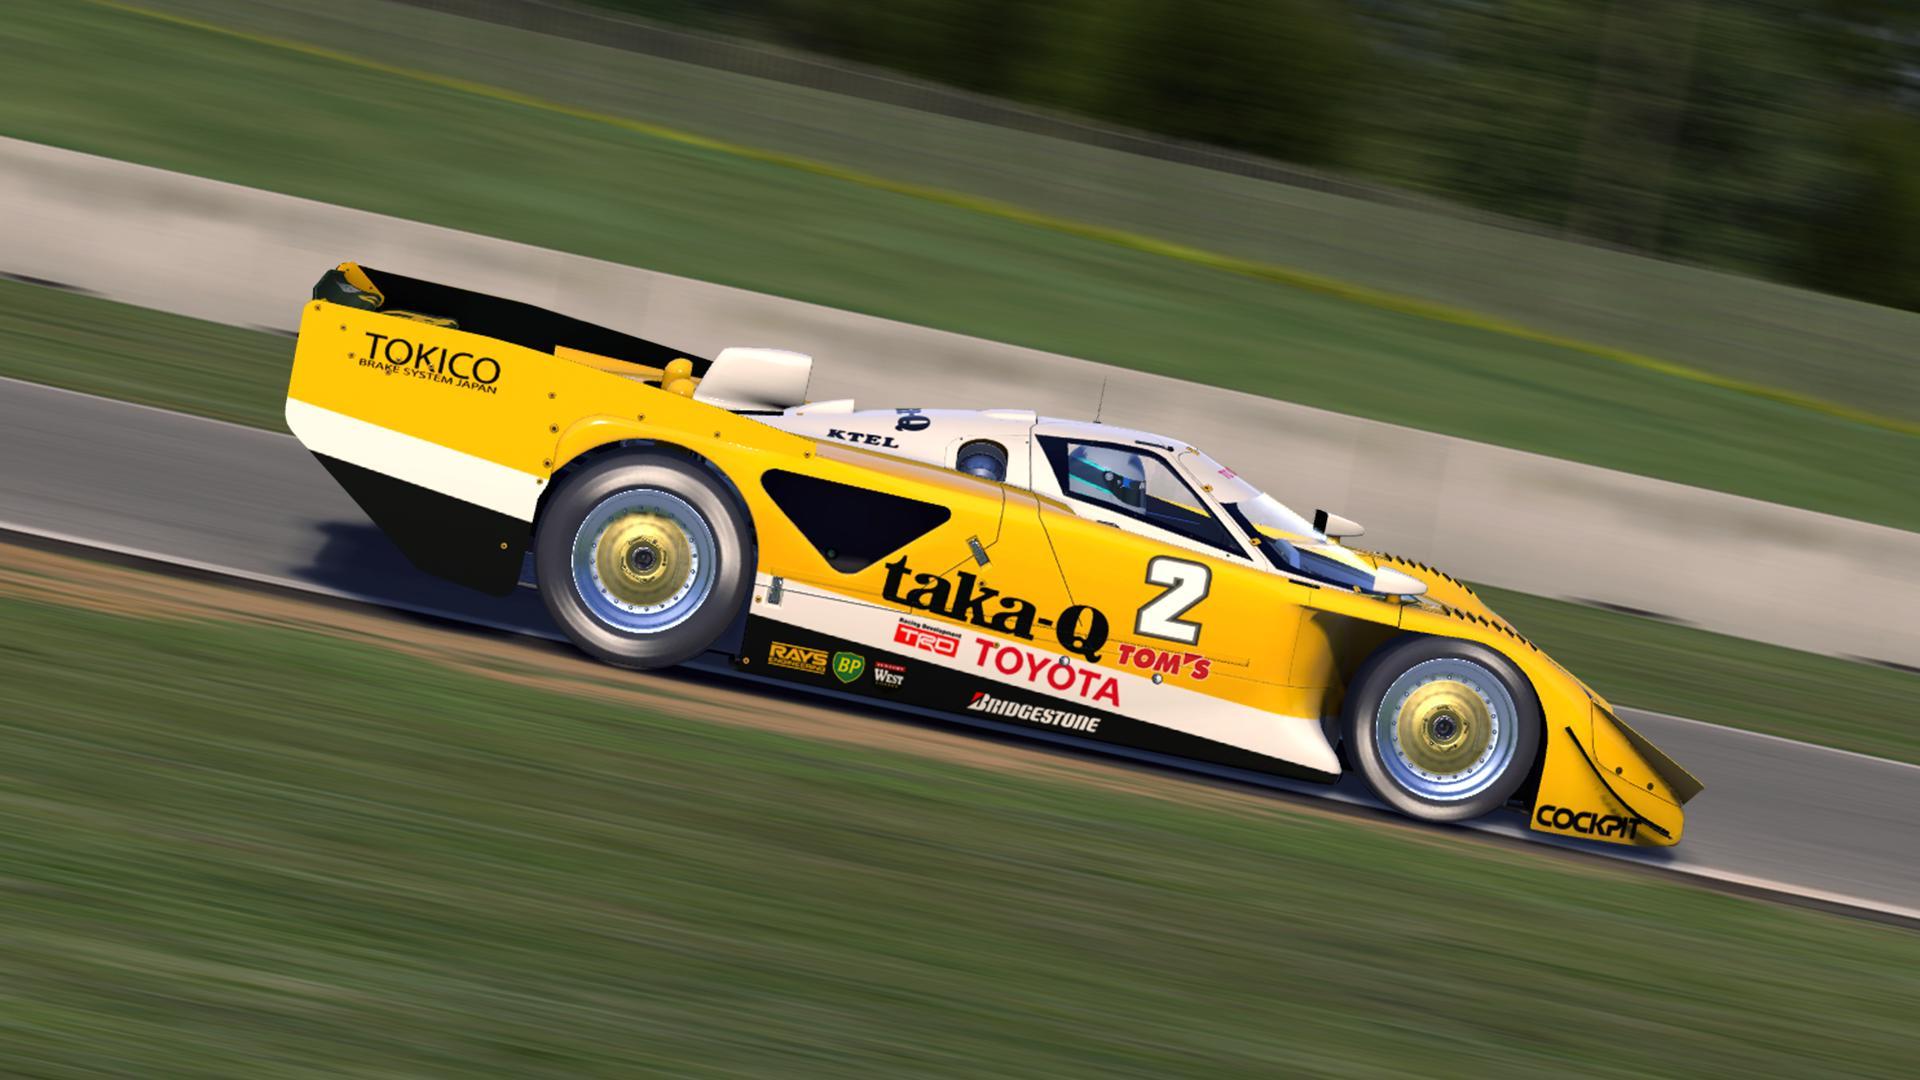 Taka Q Toyota 89c V 1989 Le Mans By Justin S Davis